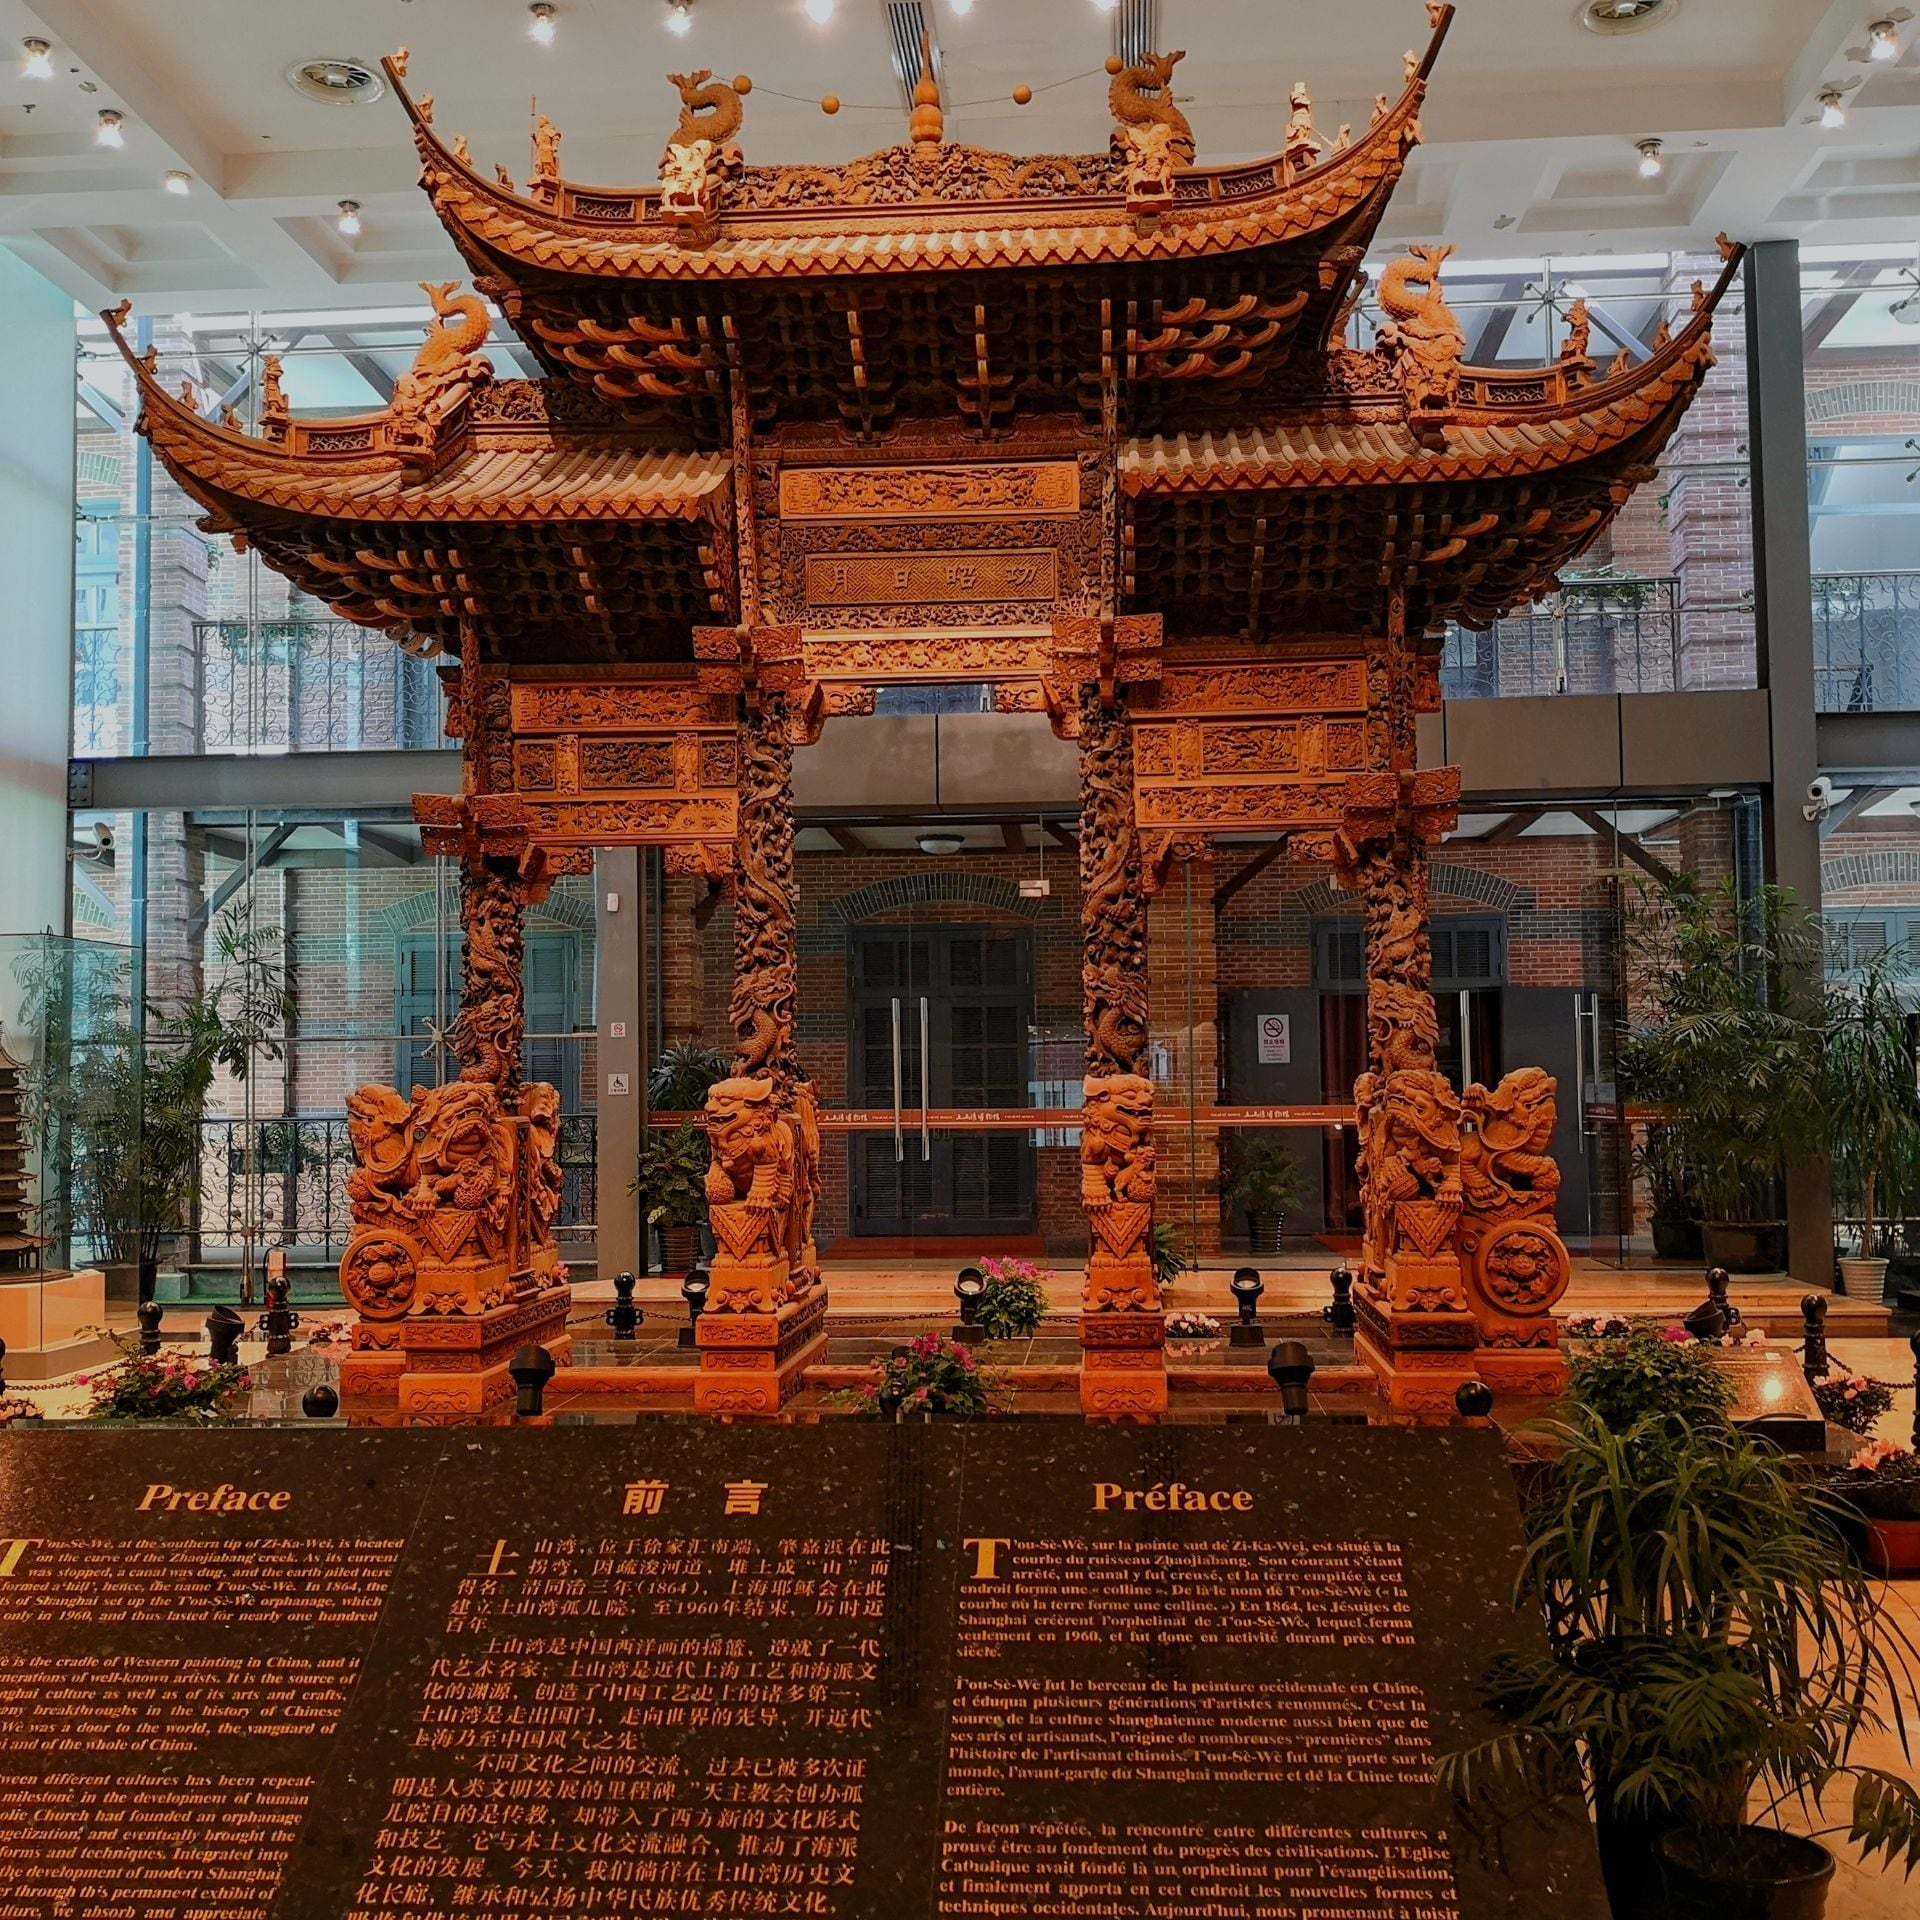 Bo Concept La Garde shanghai tou-se-we museum attractions - 龟龟0901 shanghai